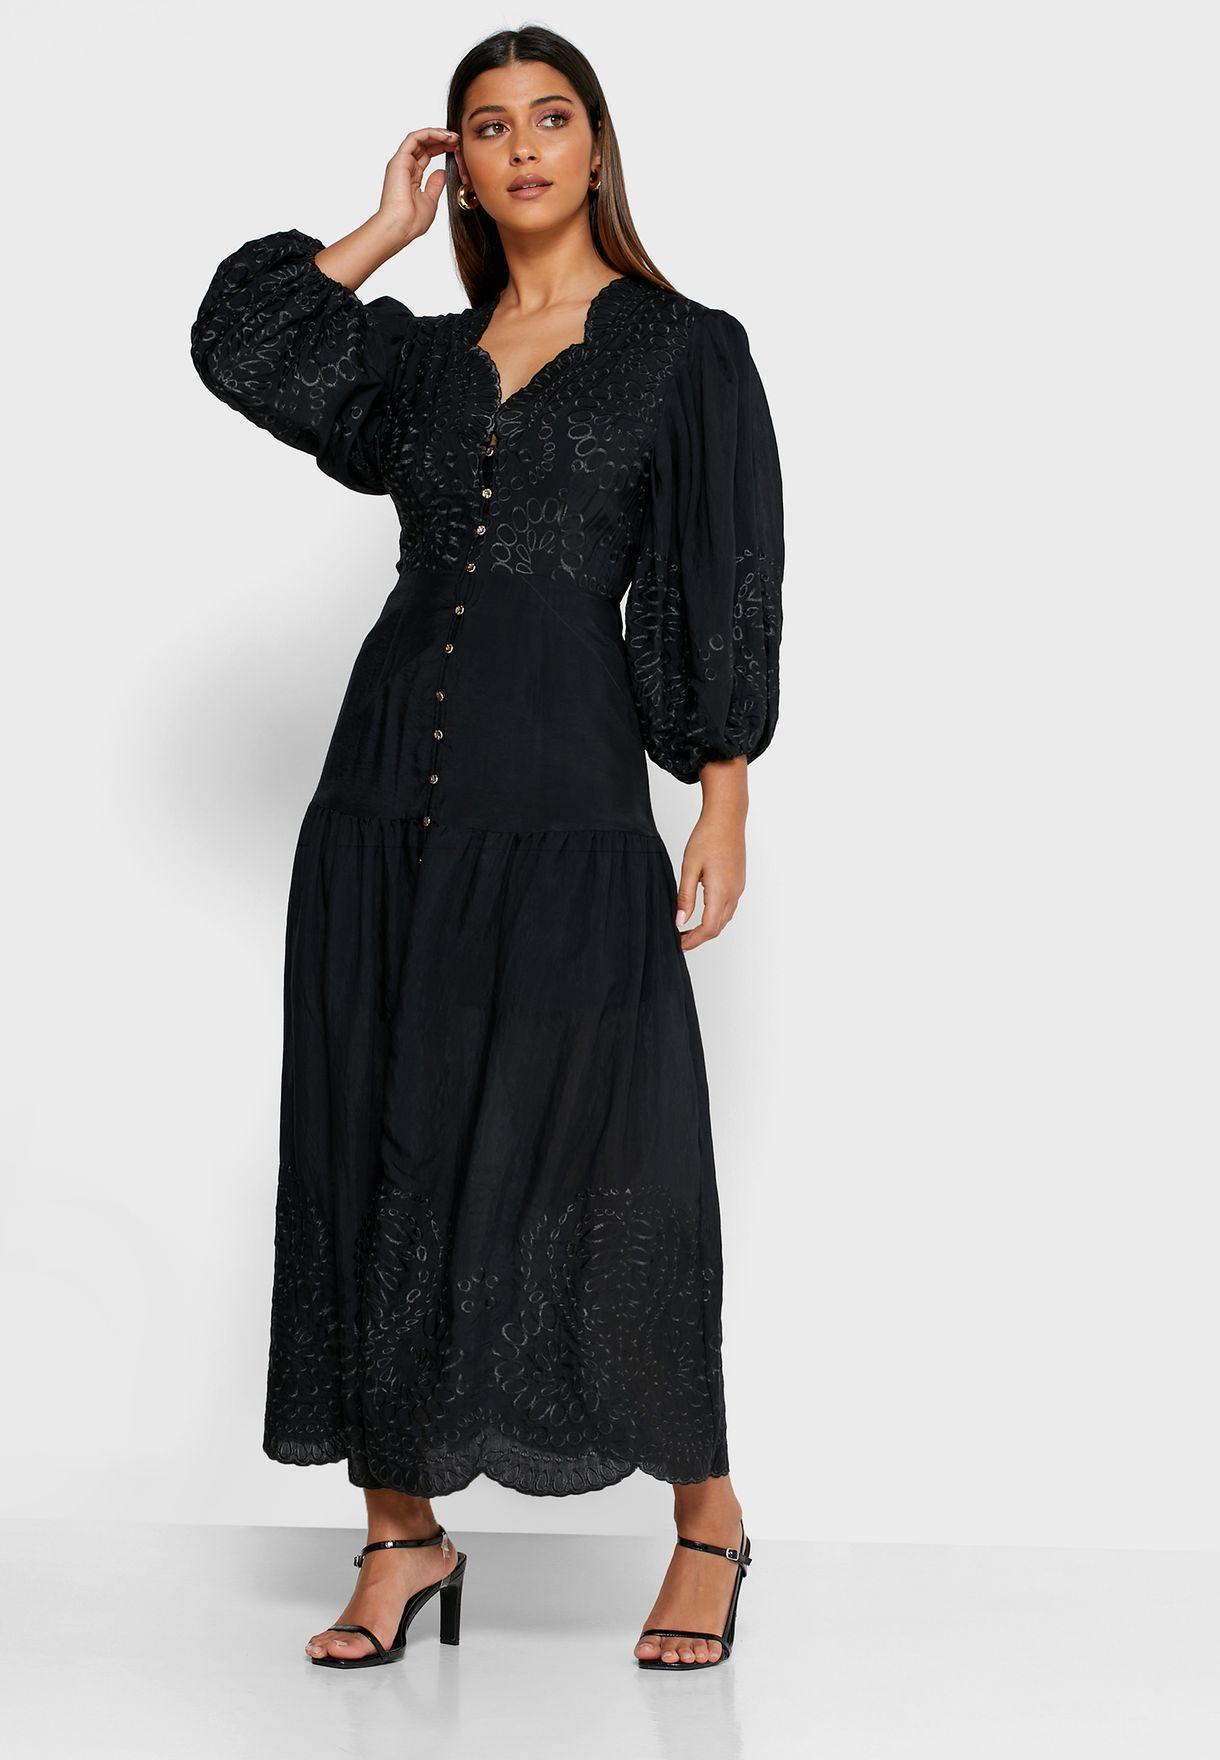 Scallop Neck Button Down Dress